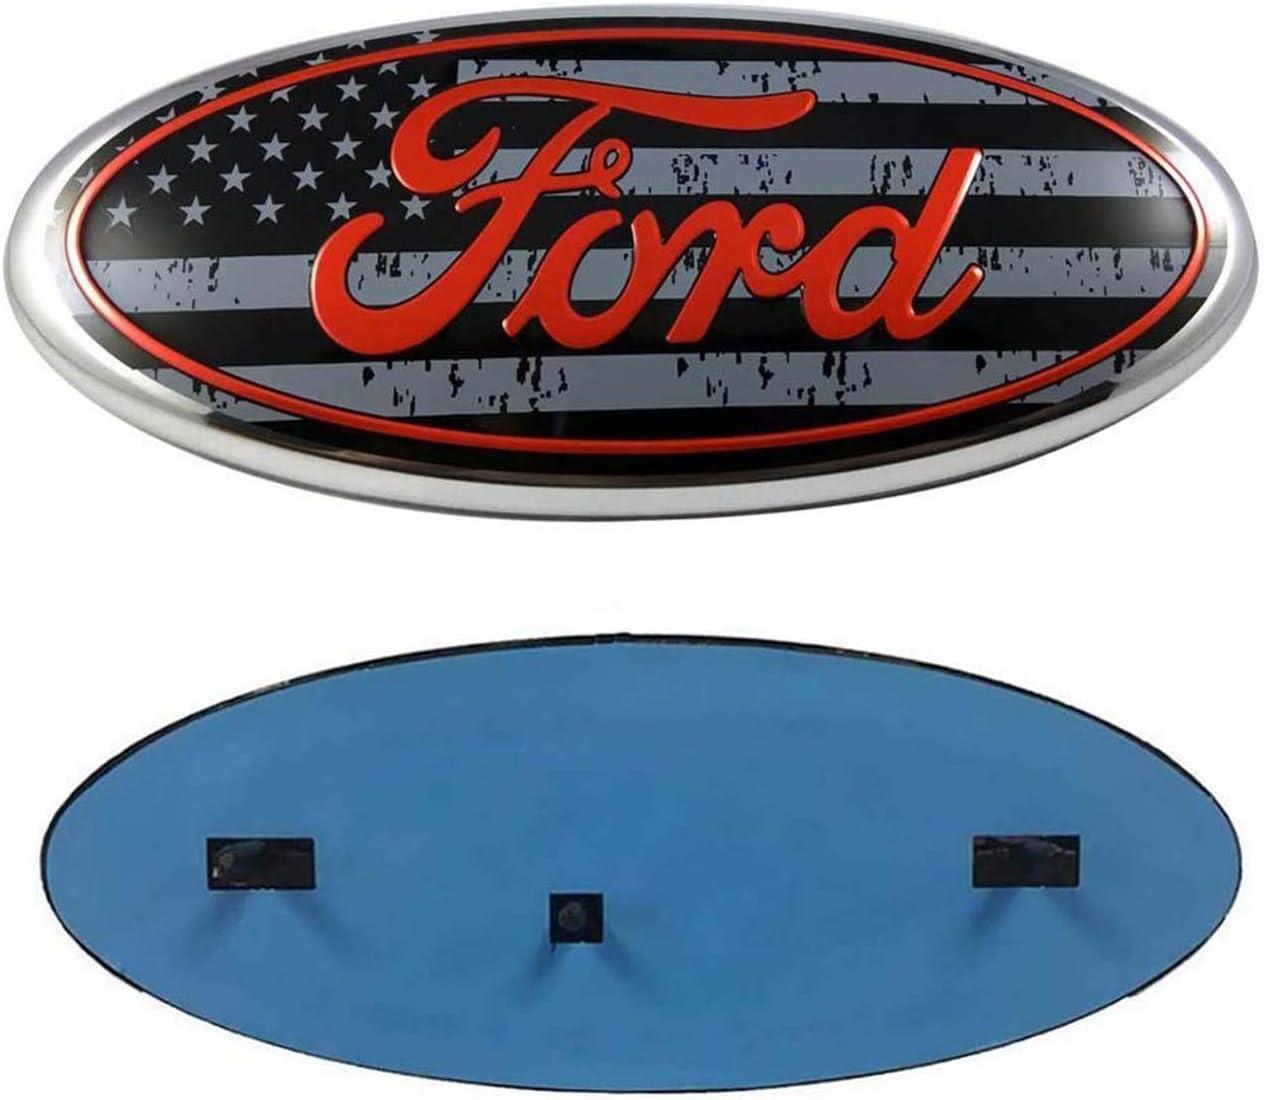 black silver quan zi Dark Blue Decal Badge Nameplate Fits for 04-14 F250 F350 11-16 Explorer 06-11 Ranger 11-14 Edge Oval 9X3.5 2004-2014 F150 Front Grille Tailgate Emblem